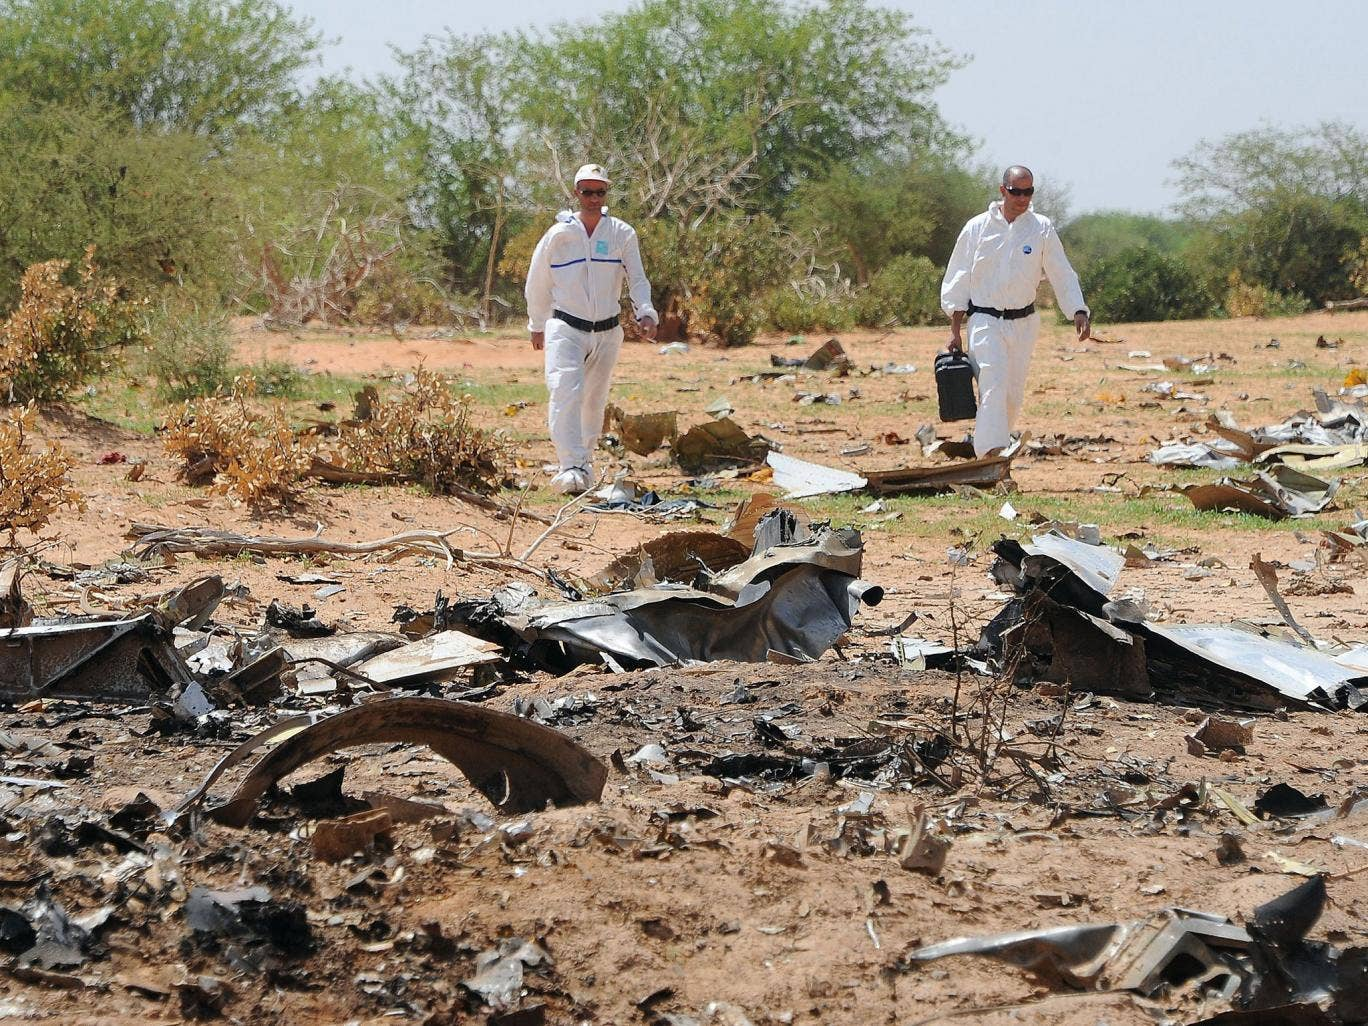 Debris from the Air Algérie aircraft crash